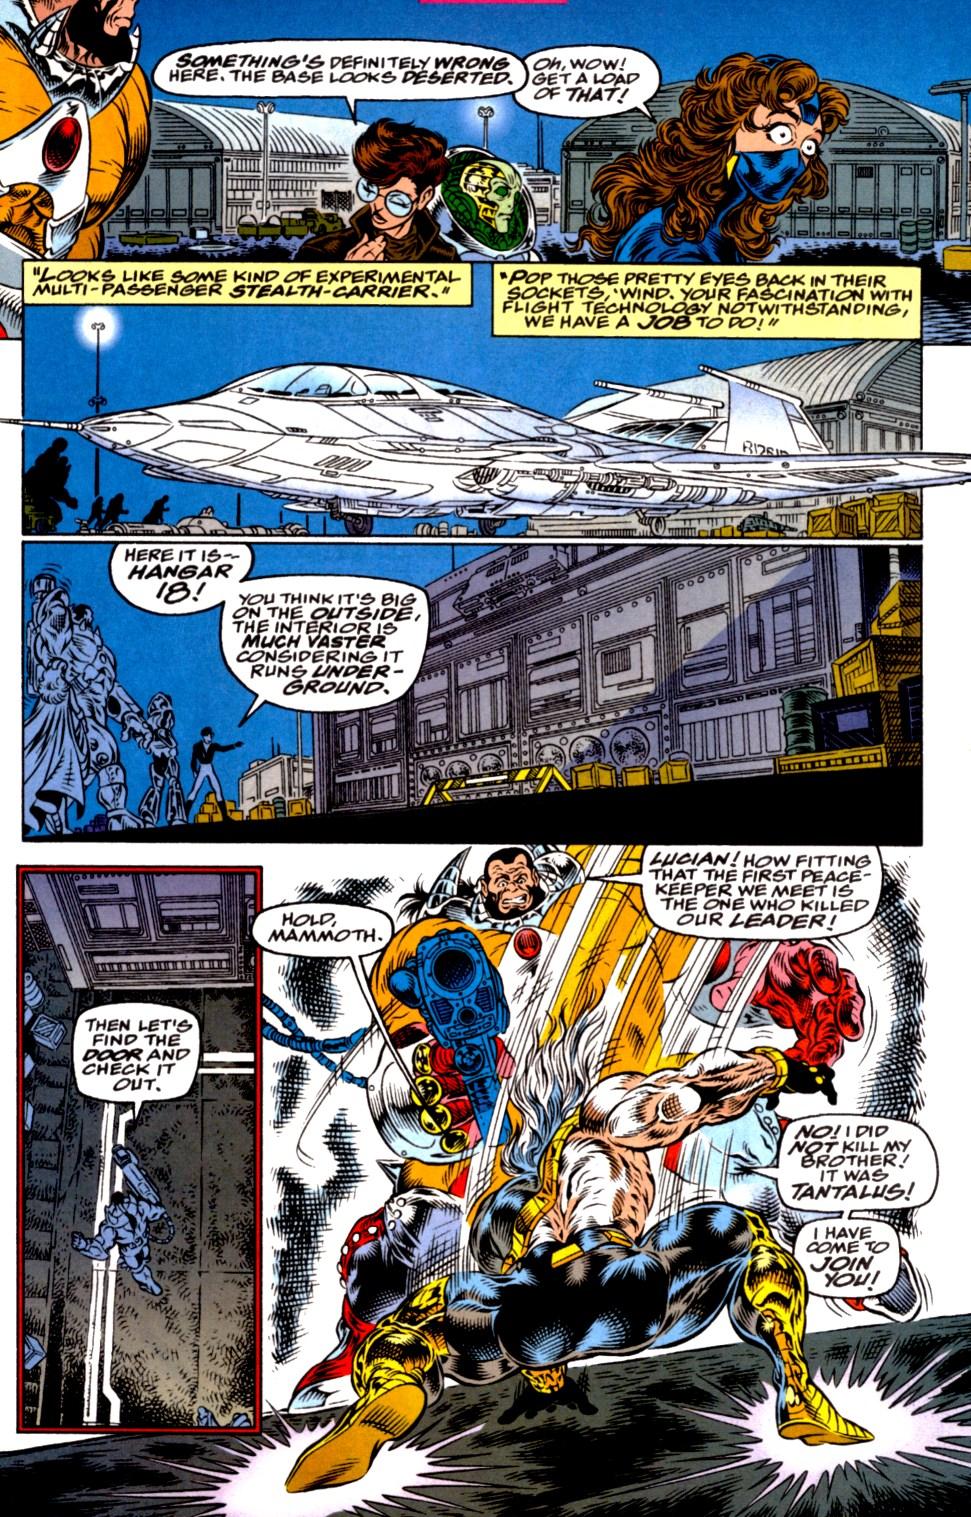 Read online Blackwulf comic -  Issue #2 - 15